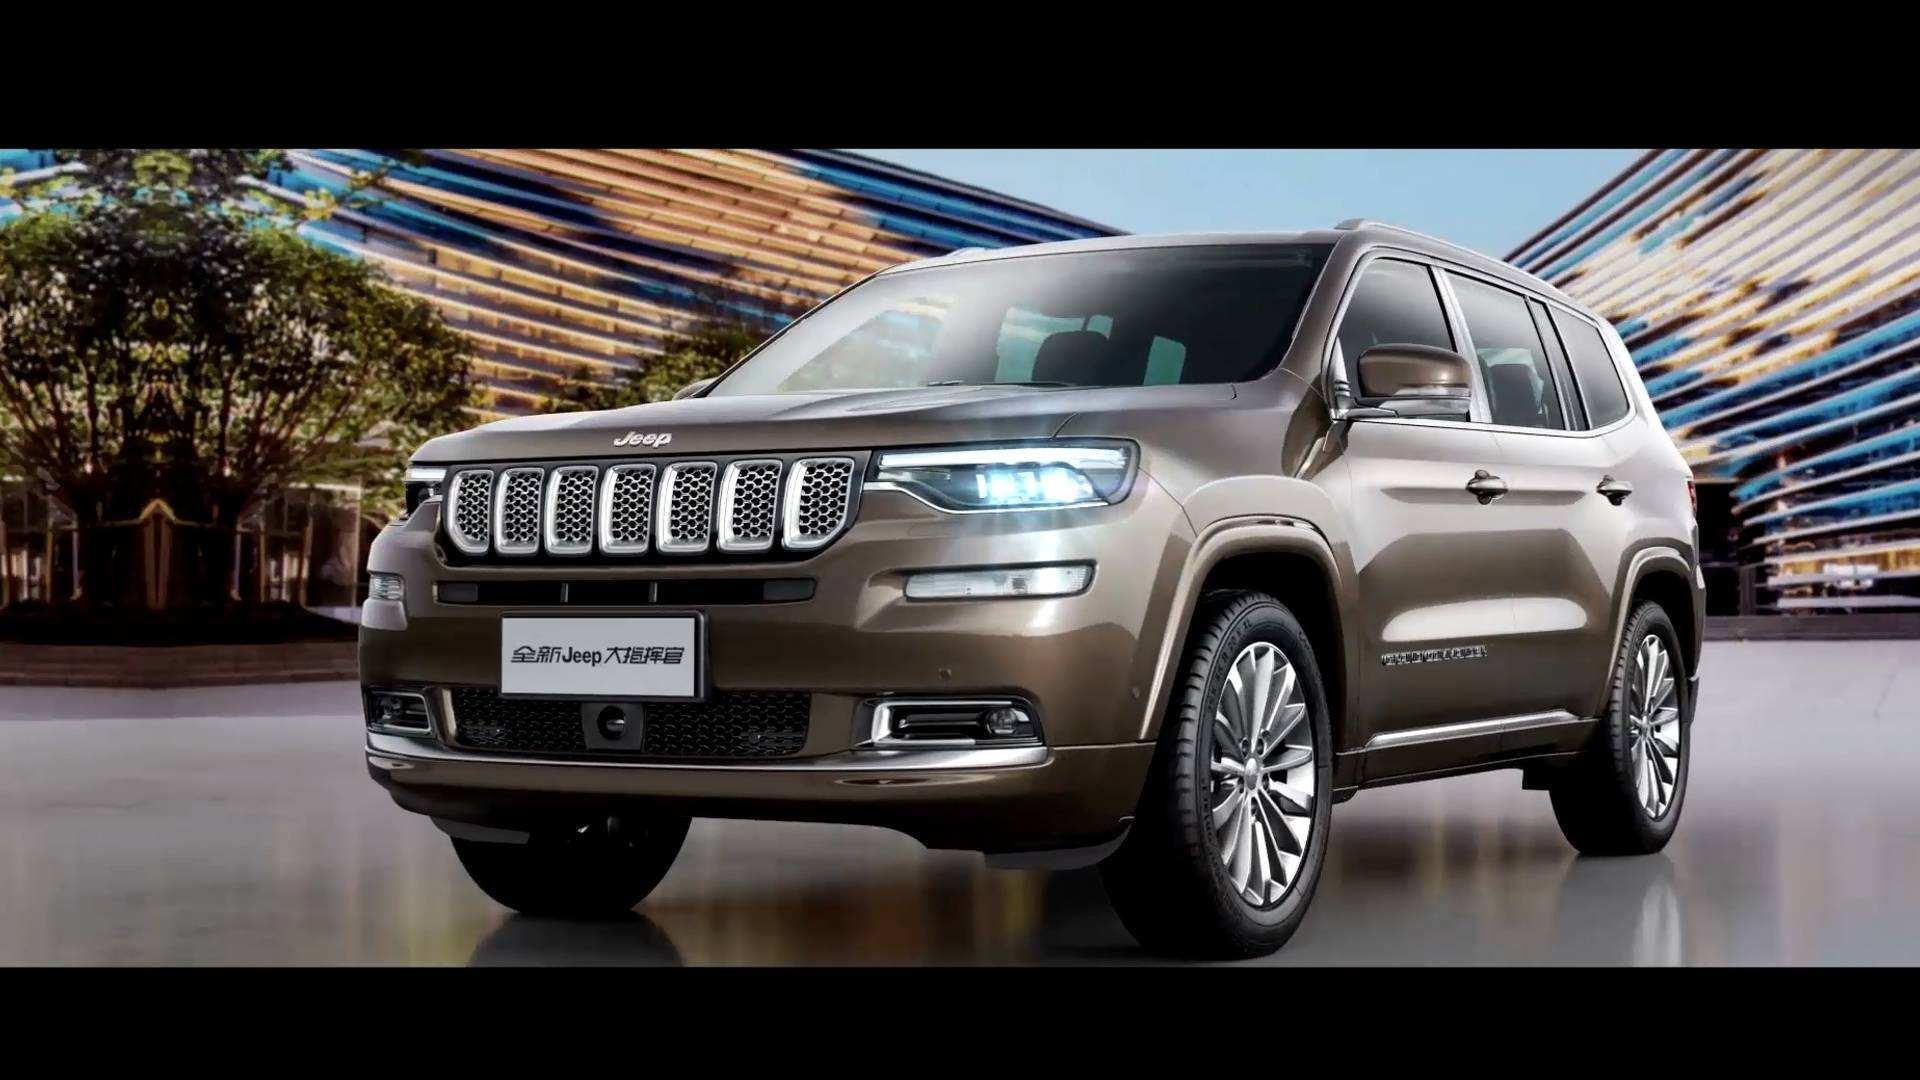 88 New New Jeep Grand Commander 2019 Price Concept with New Jeep Grand Commander 2019 Price